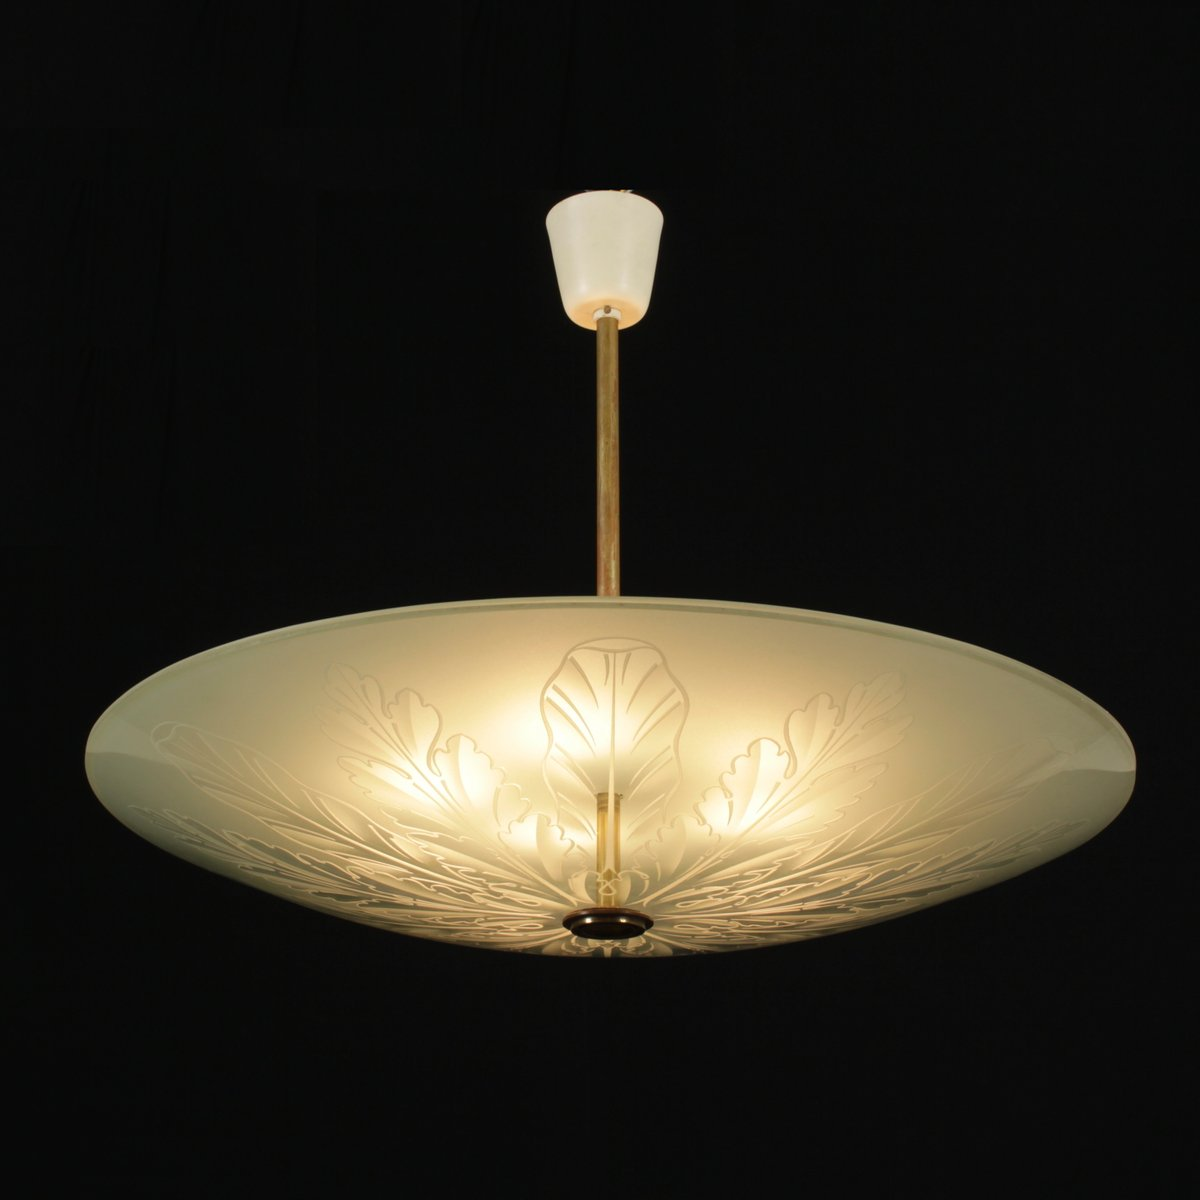 vintage lampe von pietro chiesa f r fontana arte bei pamono kaufen. Black Bedroom Furniture Sets. Home Design Ideas